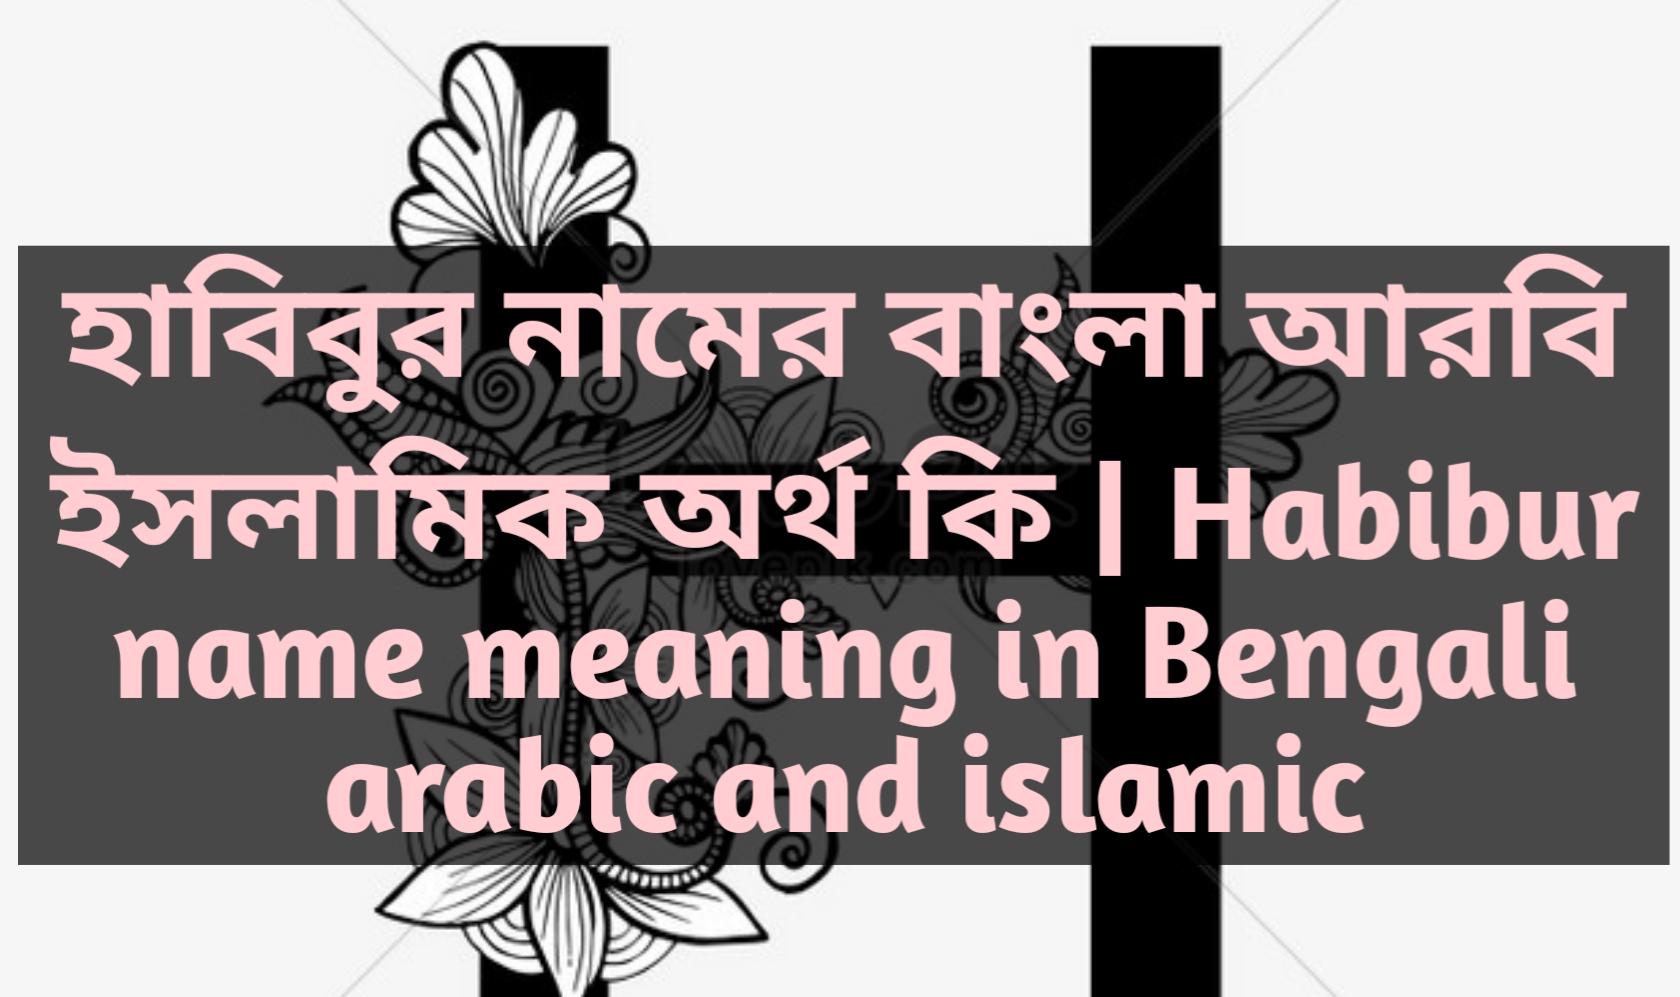 habibur name meaning in Bengali, হাবিবুর নামের অর্থ কি, হাবিবুর নামের বাংলা অর্থ কি, হাবিবুর নামের ইসলামিক অর্থ কি,